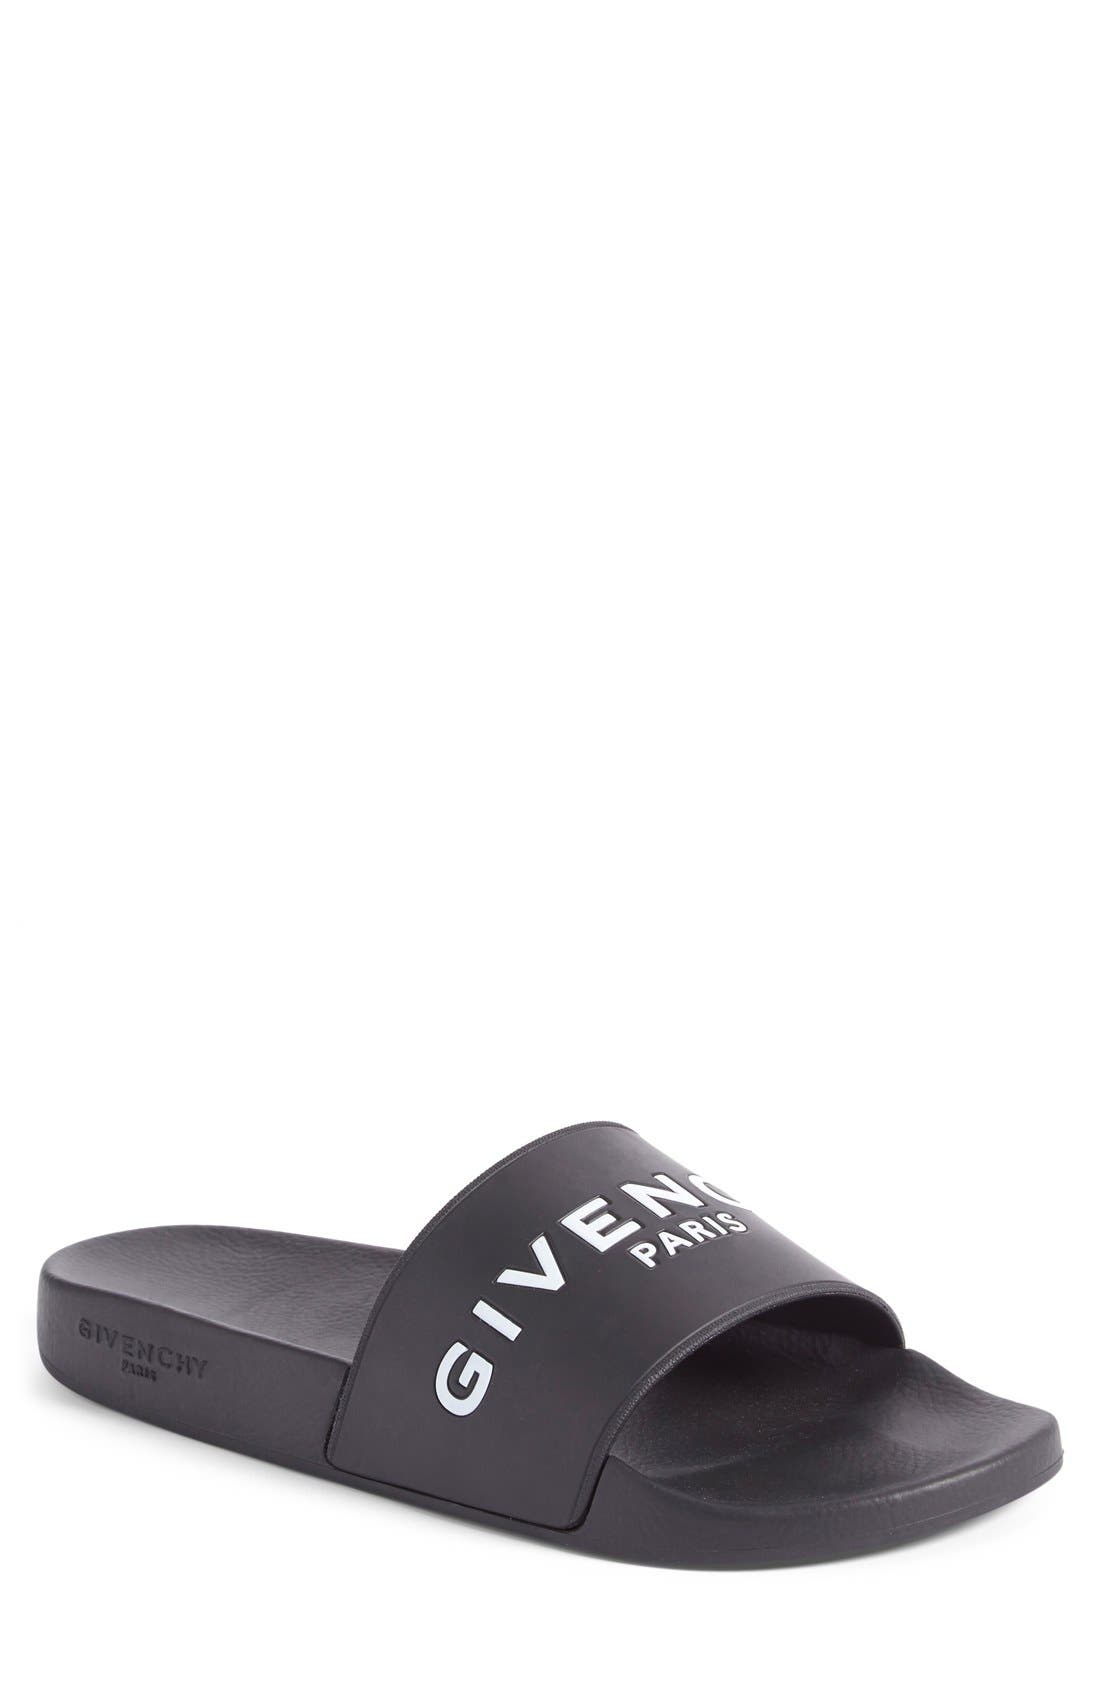 Slide Sandal,                             Main thumbnail 1, color,                             Black